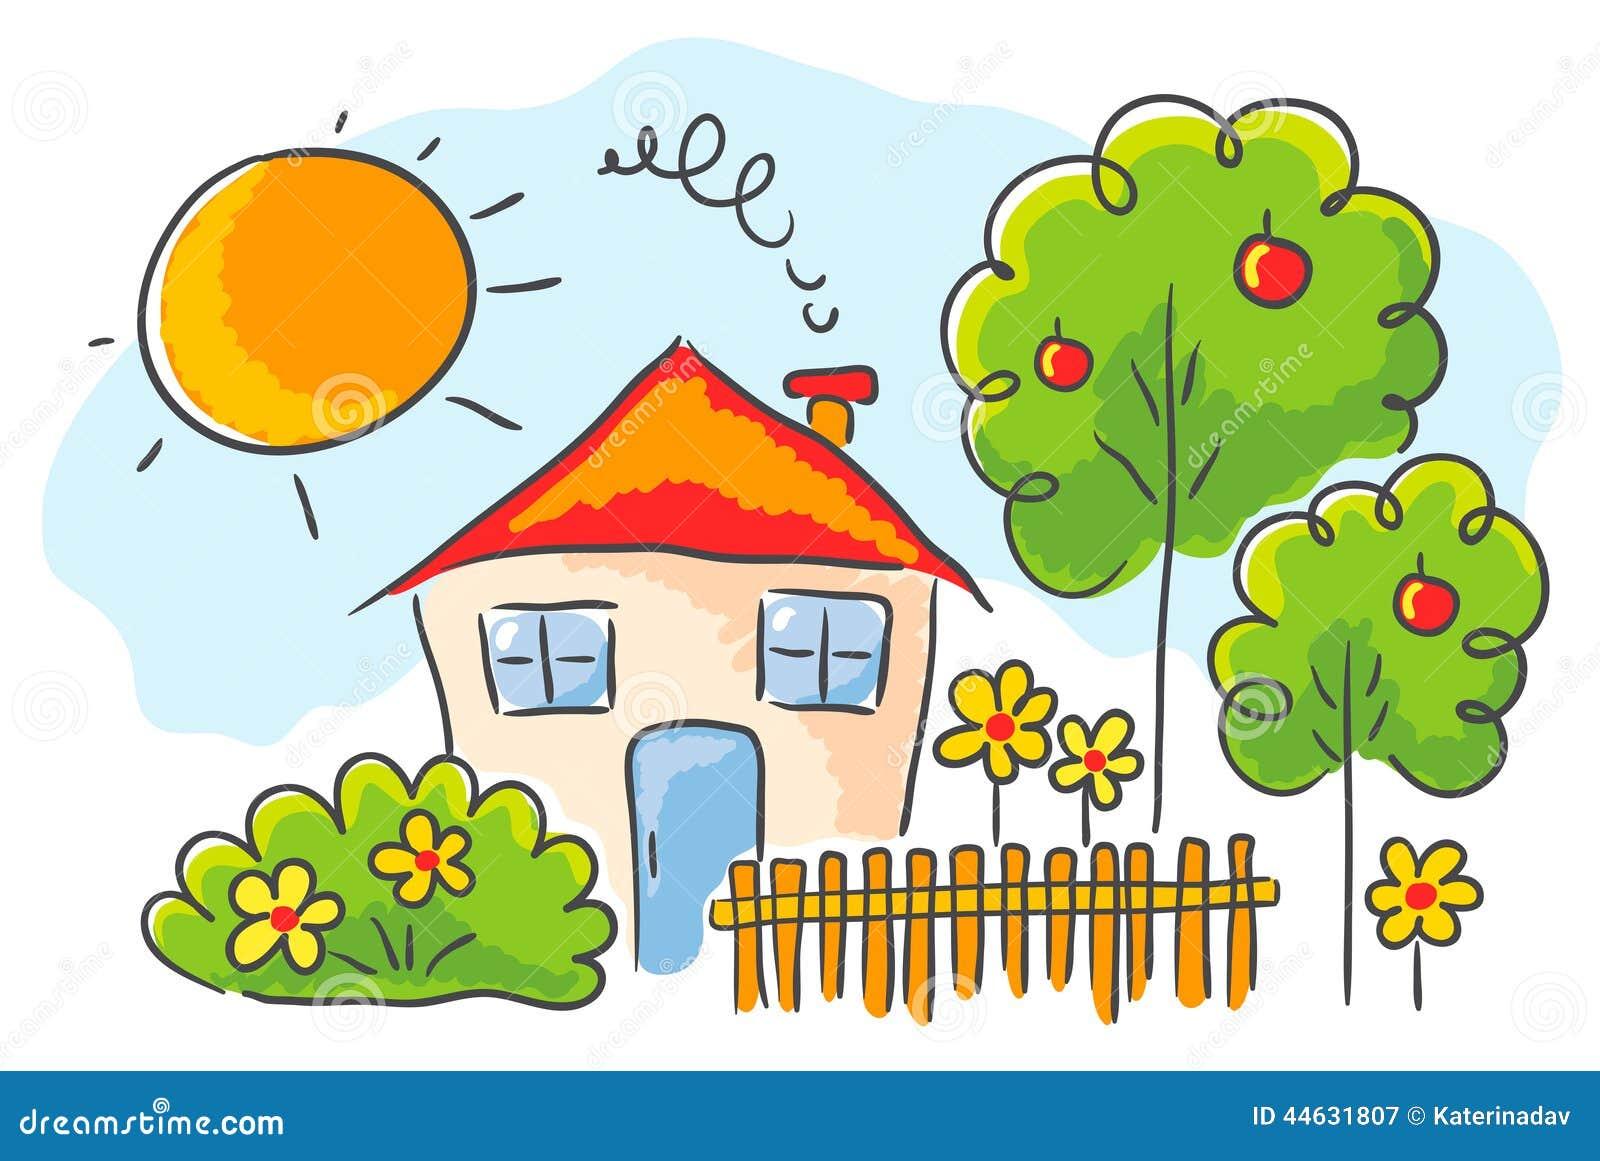 儿童房子的` s图画